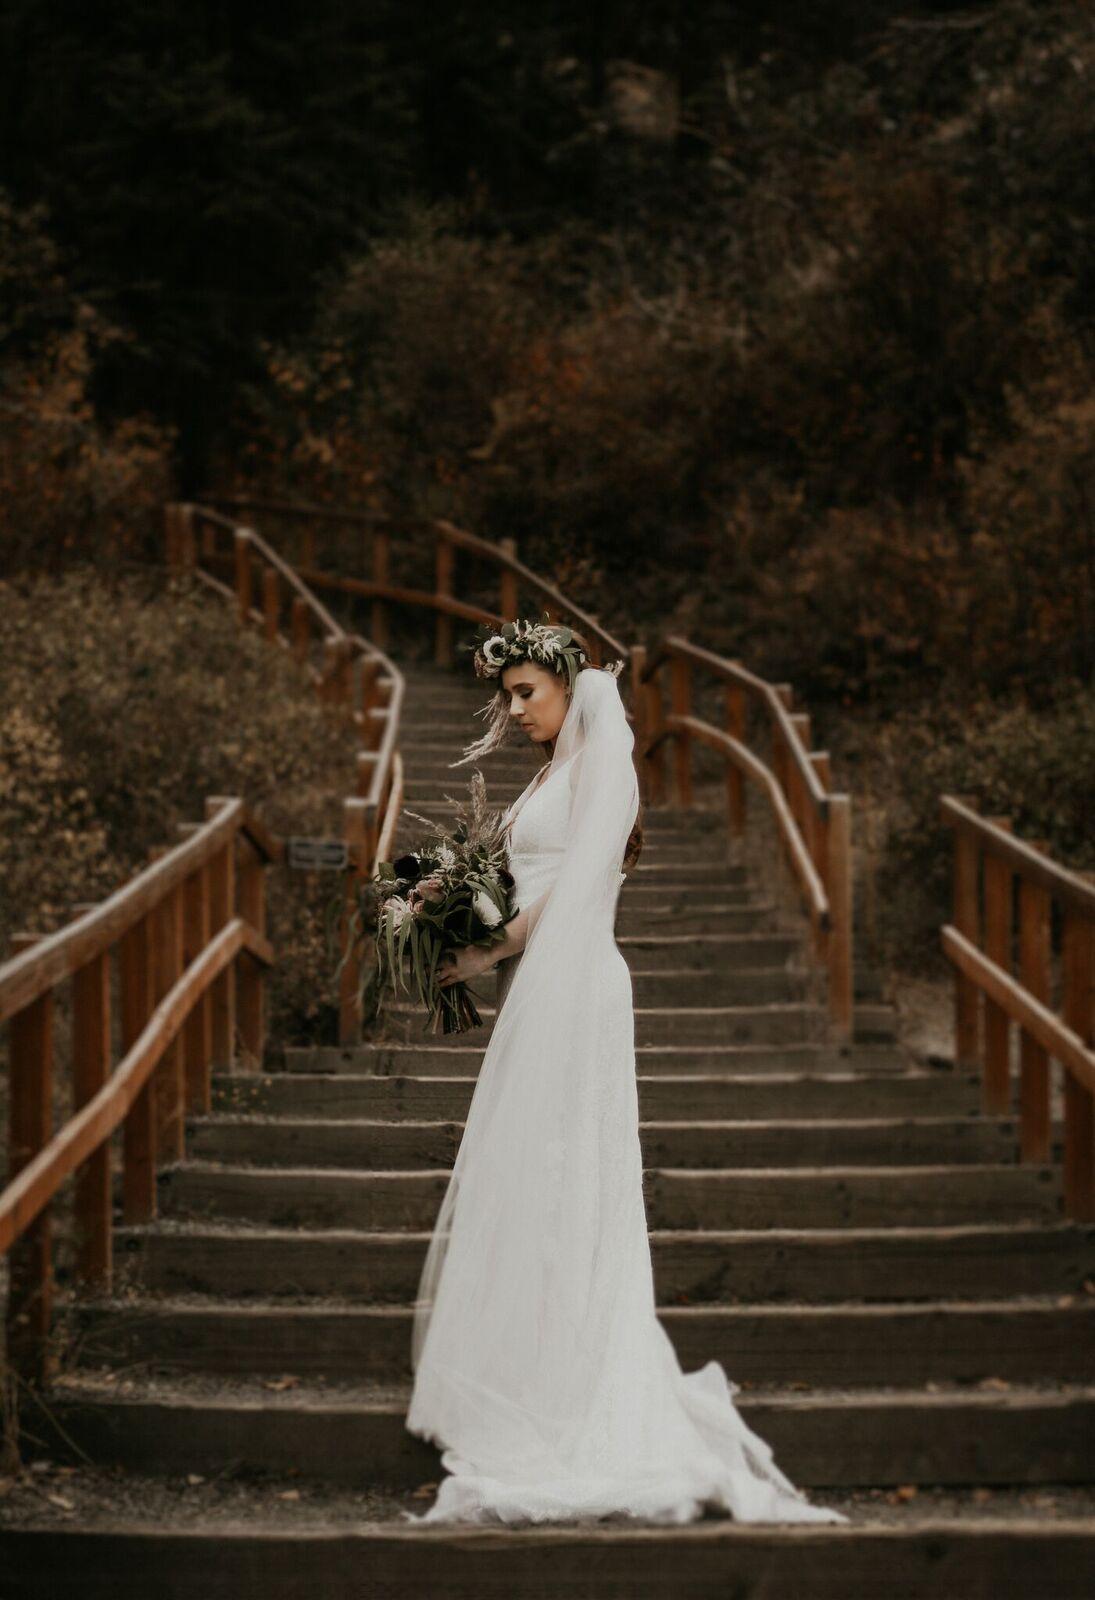 spokane river wedding photo shoot image11